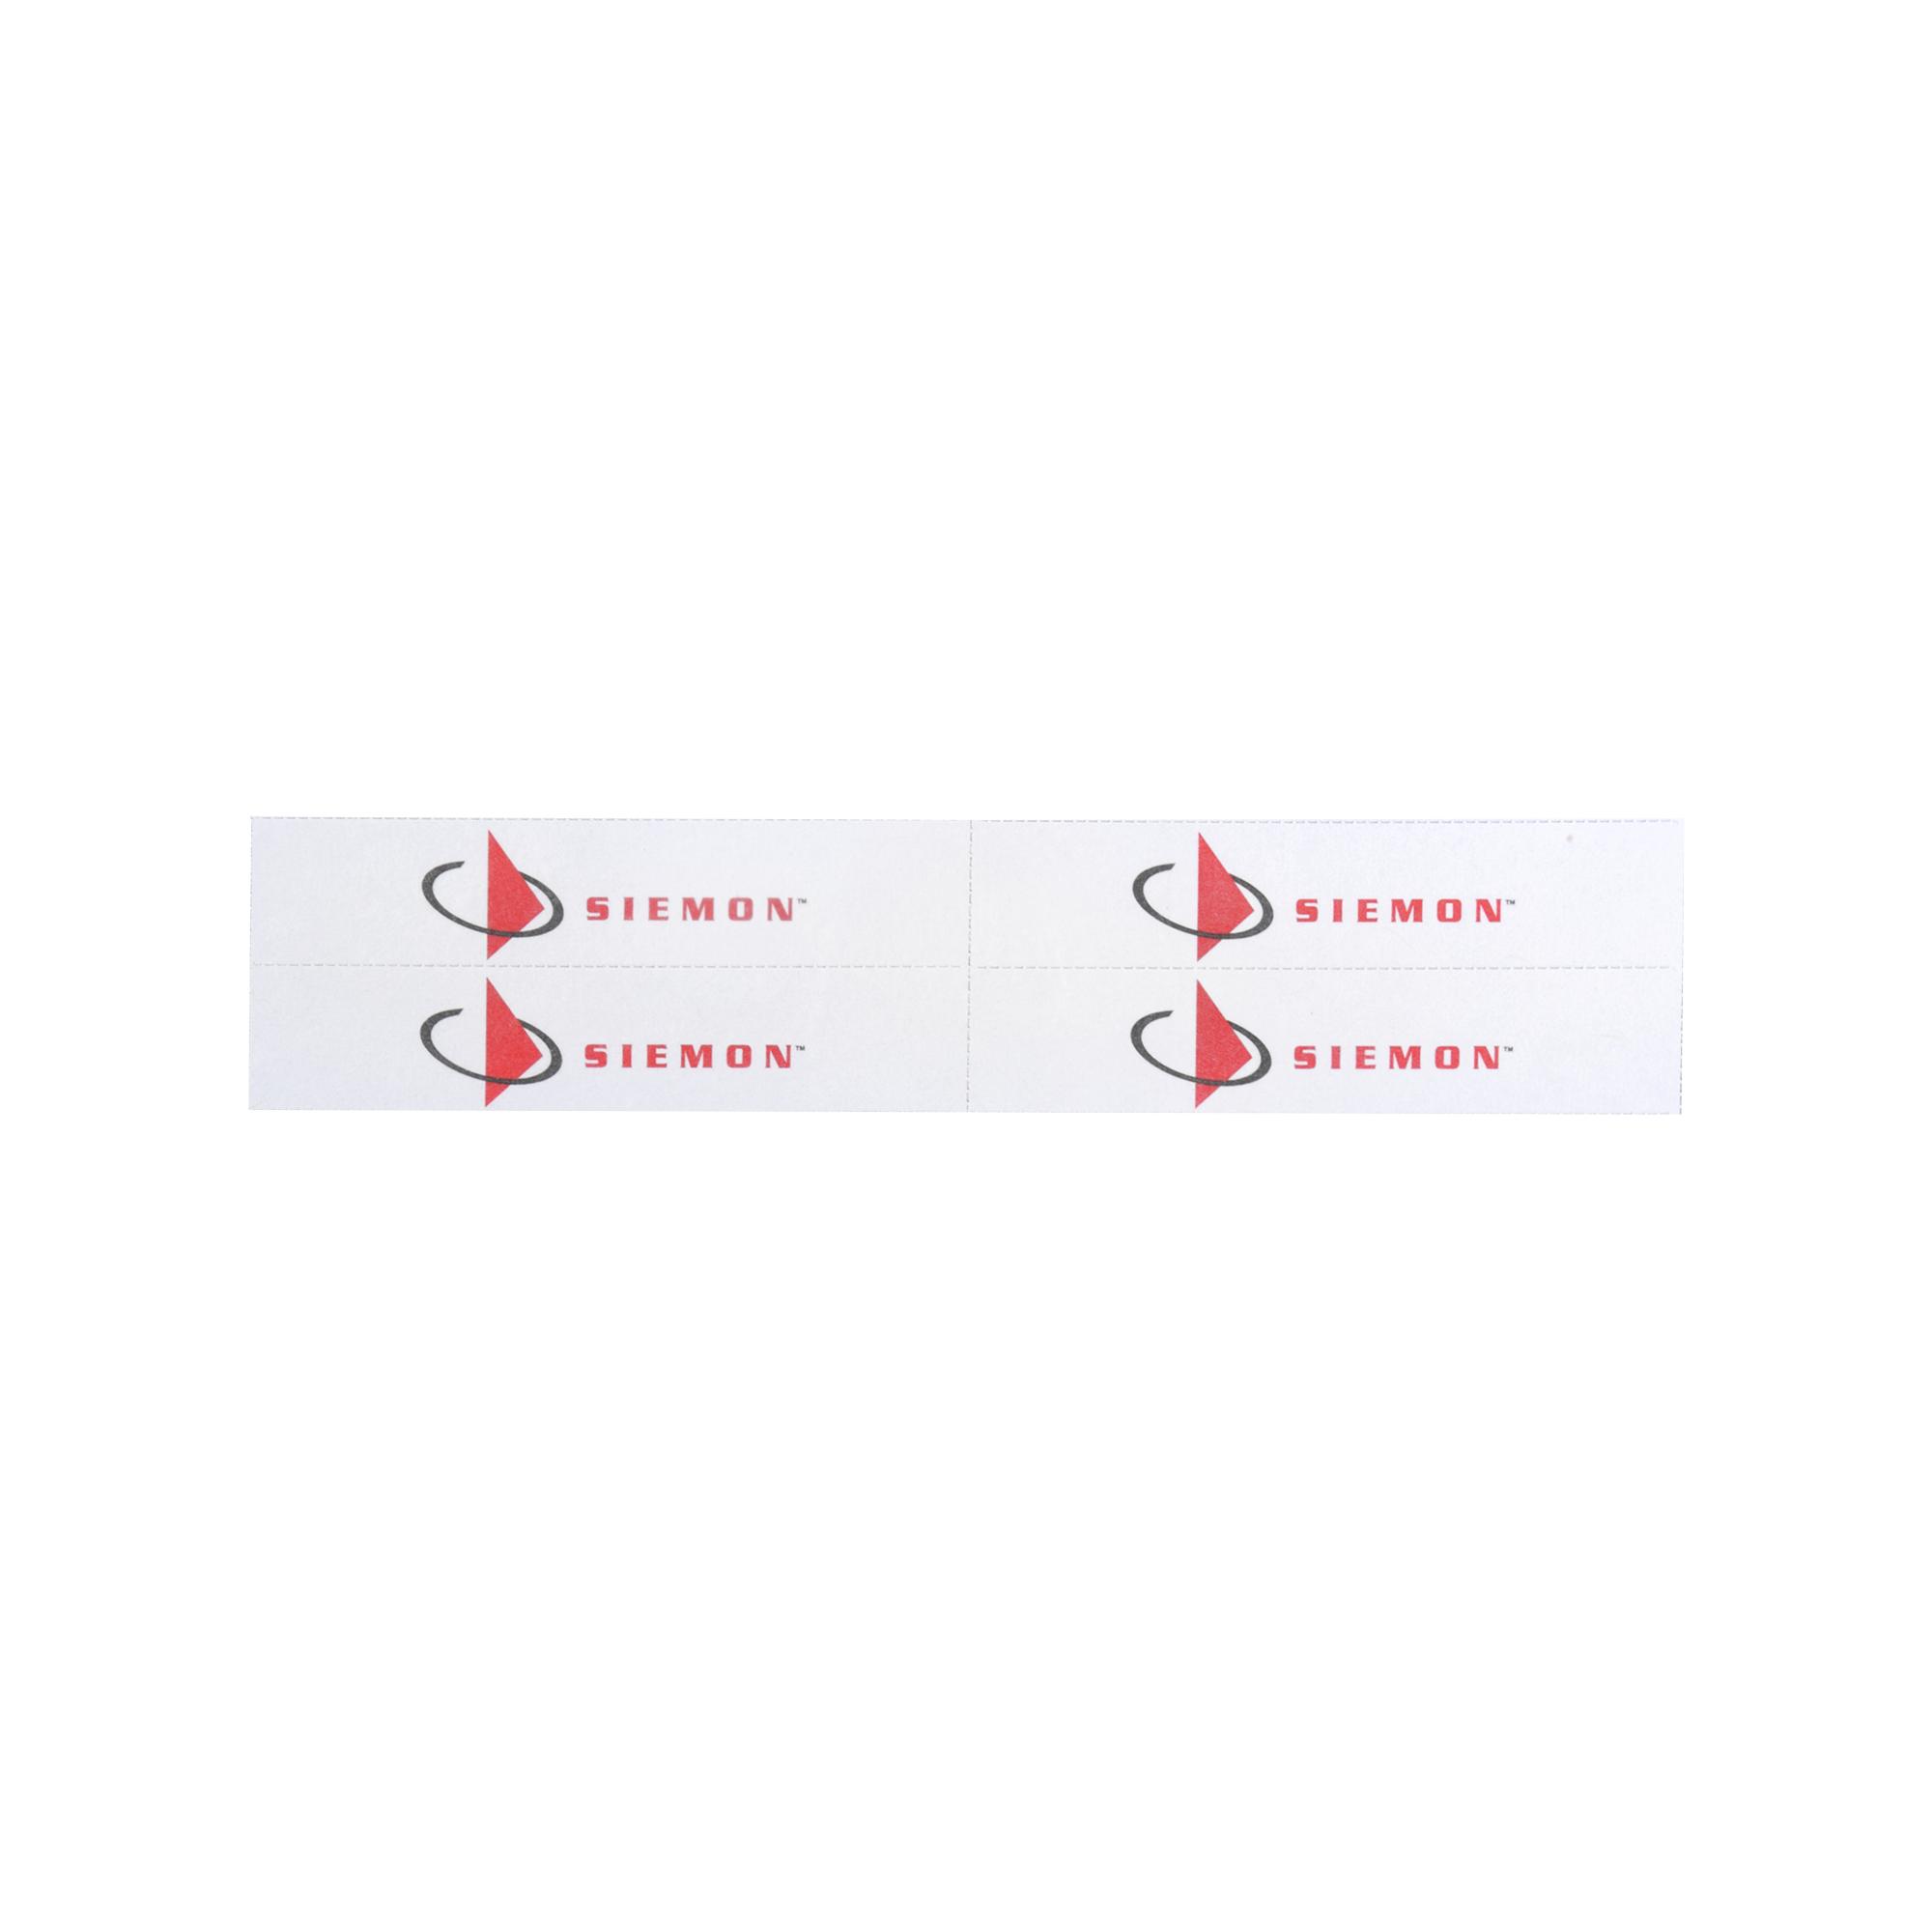 Hoja de Etiquetas para Face Plate CT, 10 Hojas, Para 104 Etiquetas